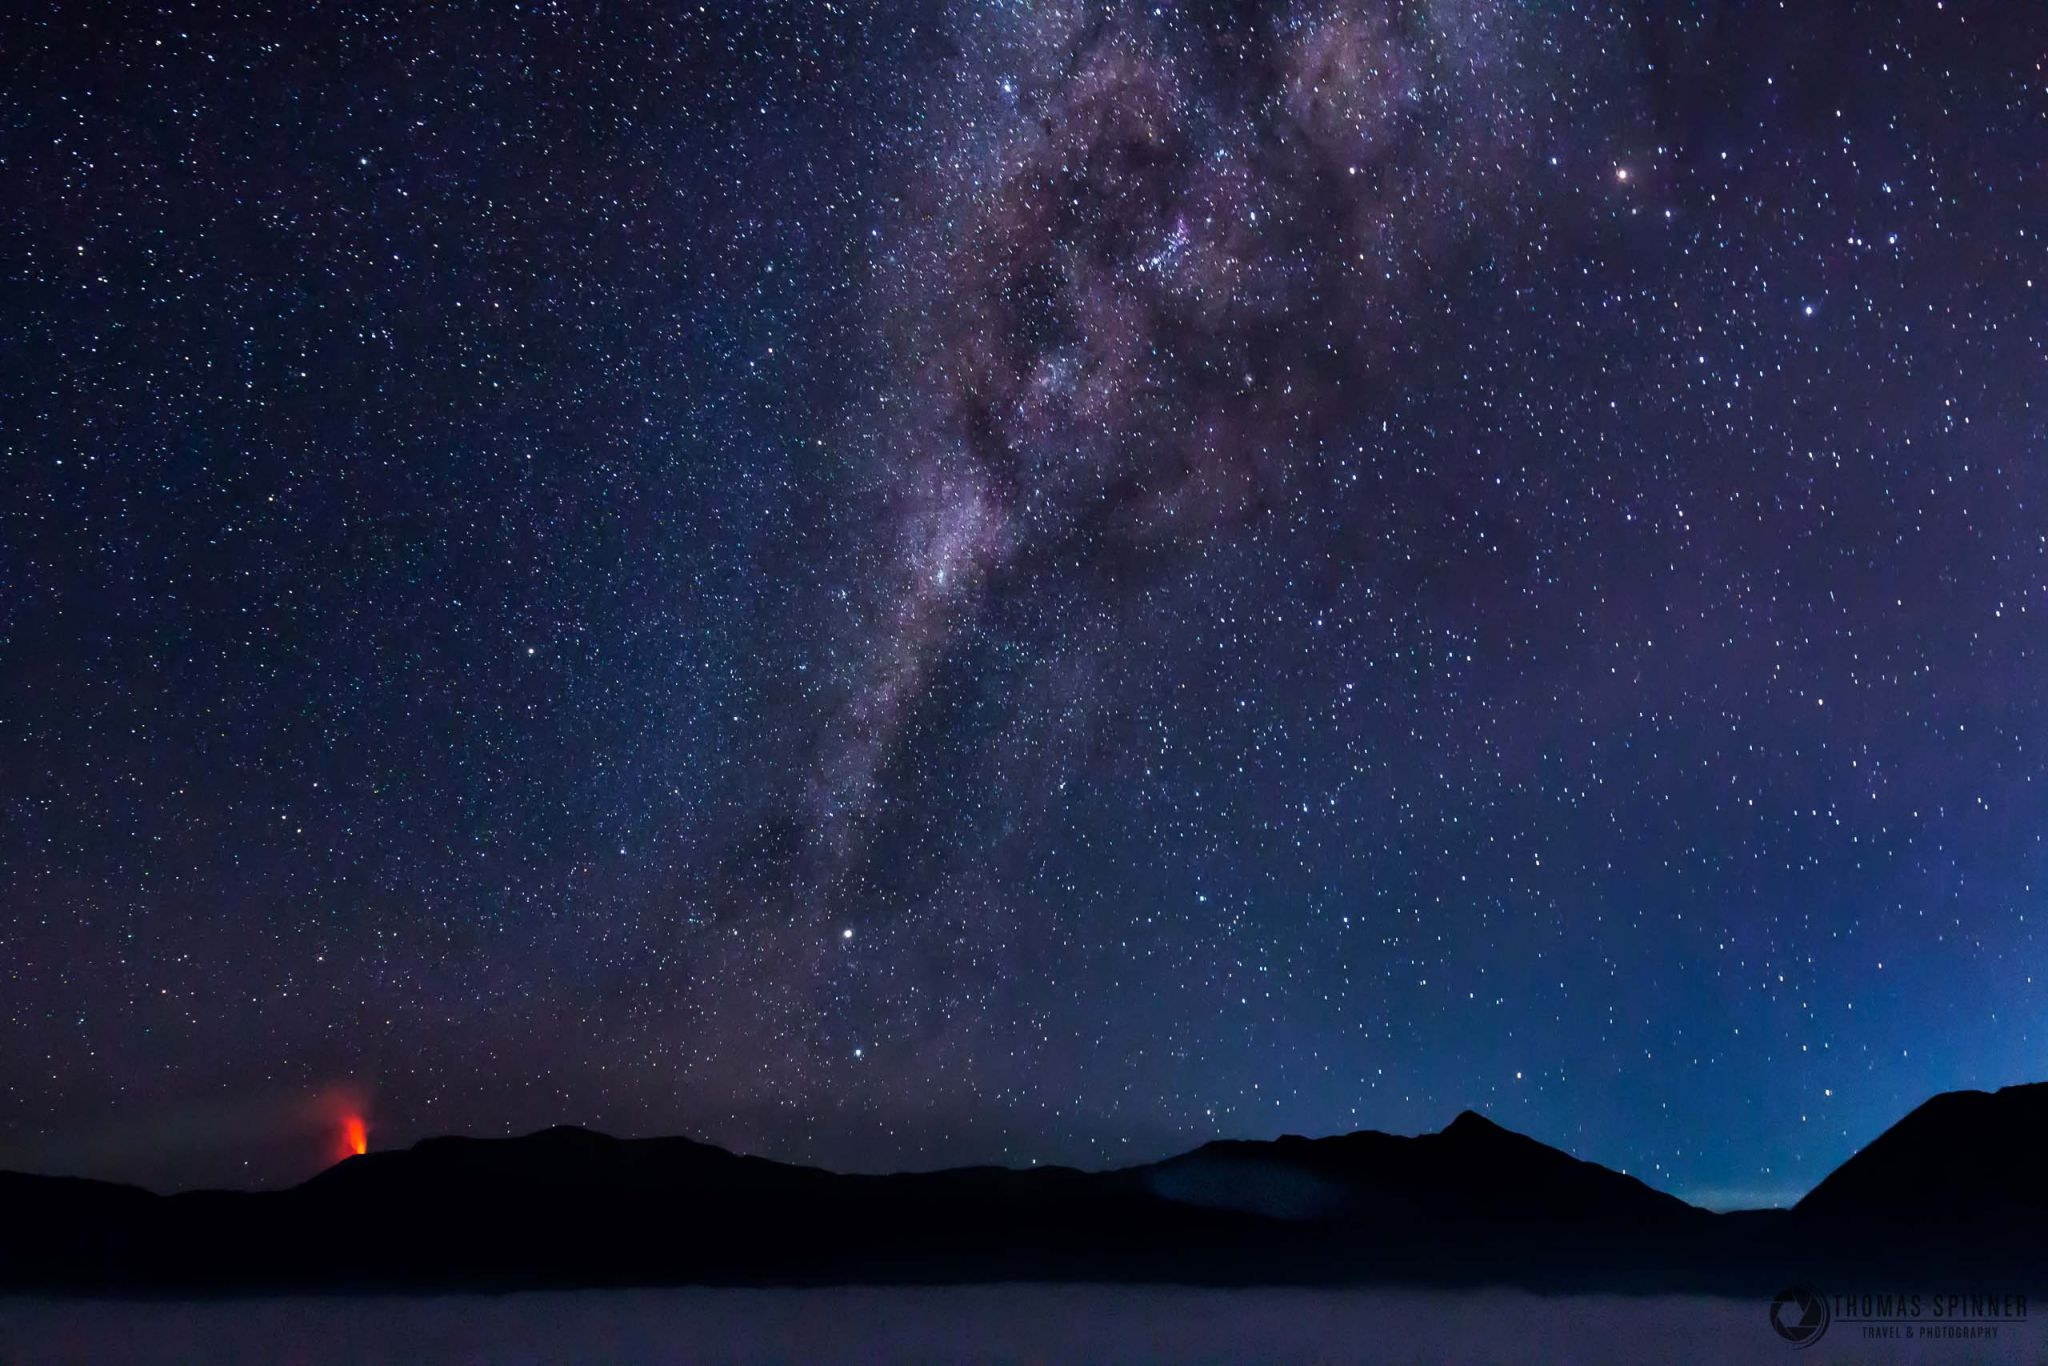 Stars @ Tengger Caldera, Indonesia